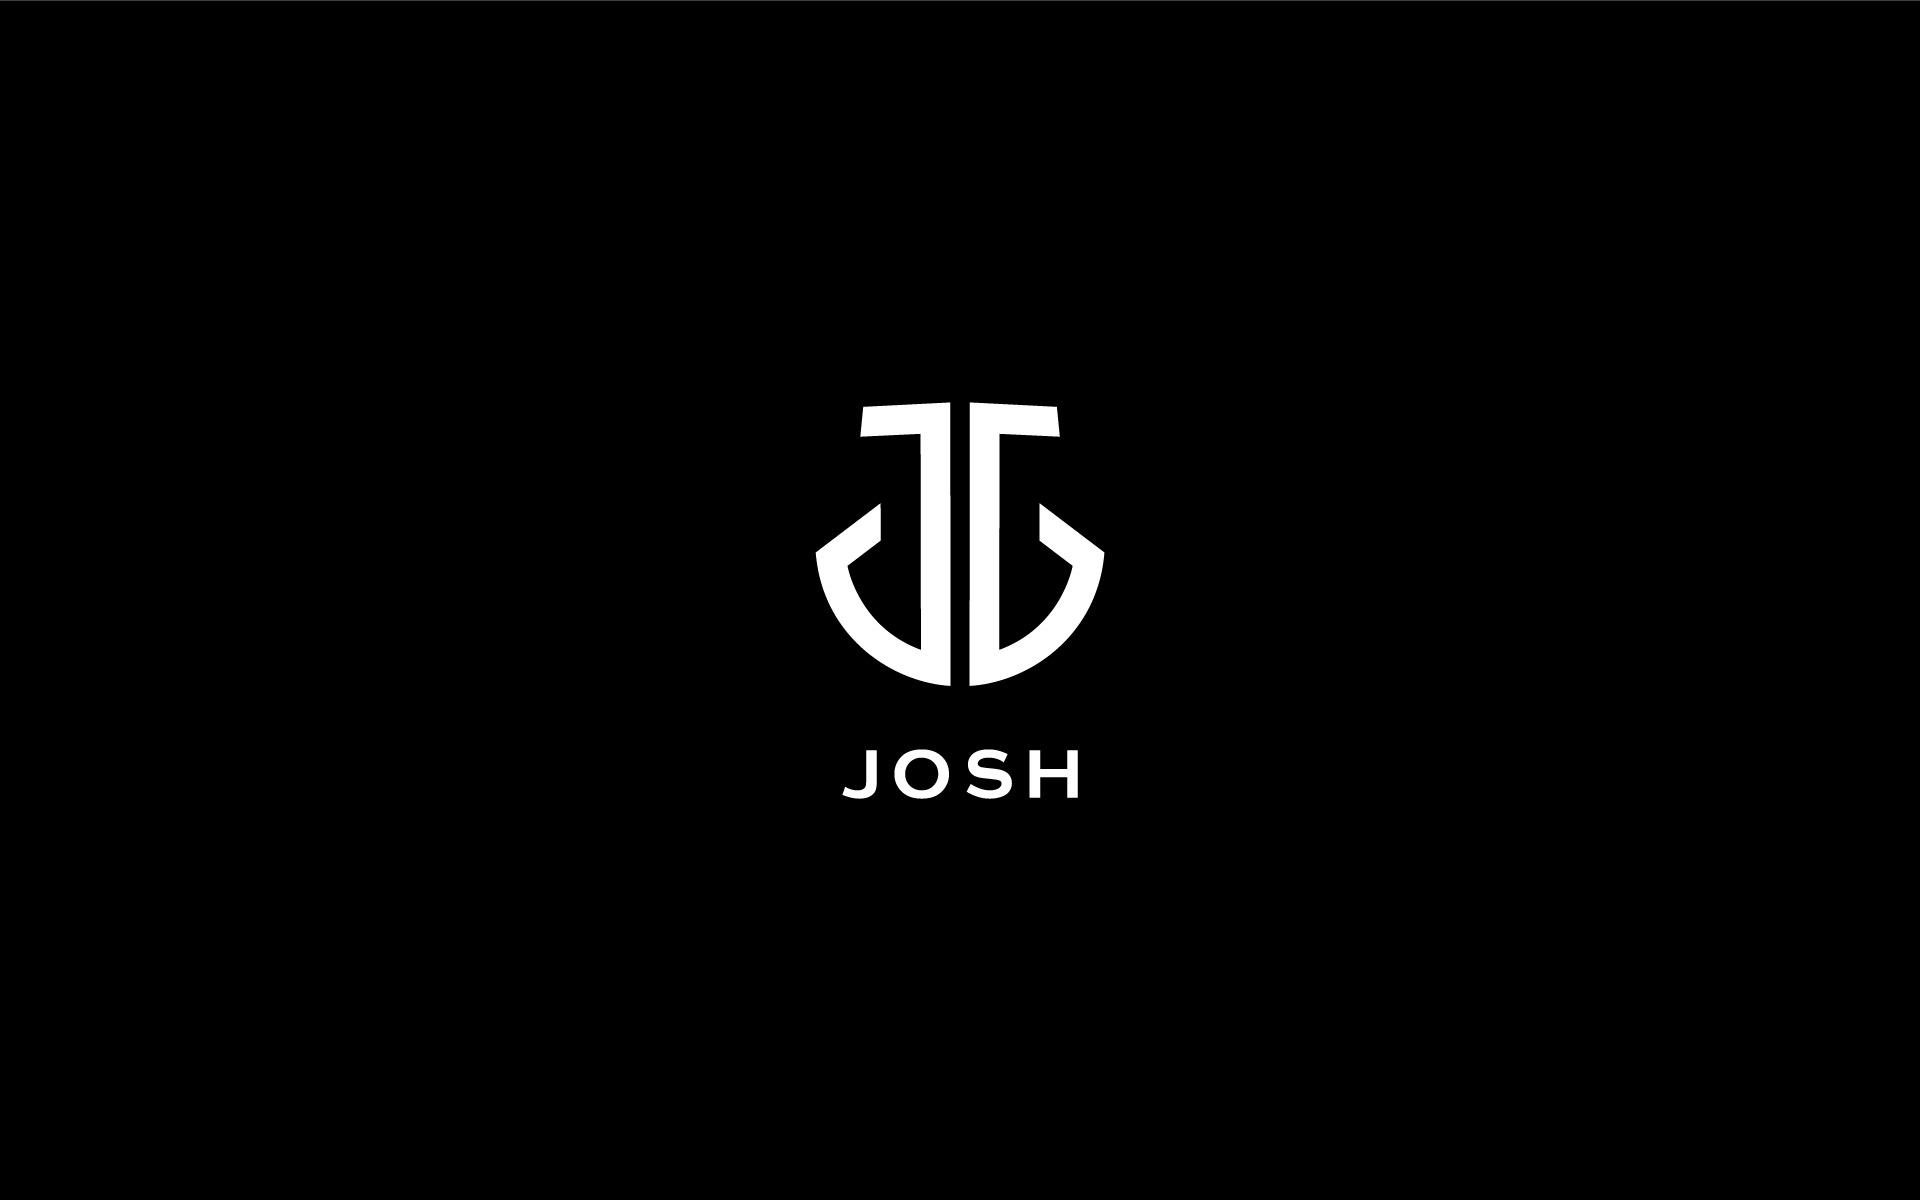 Simbolo-JOSH7